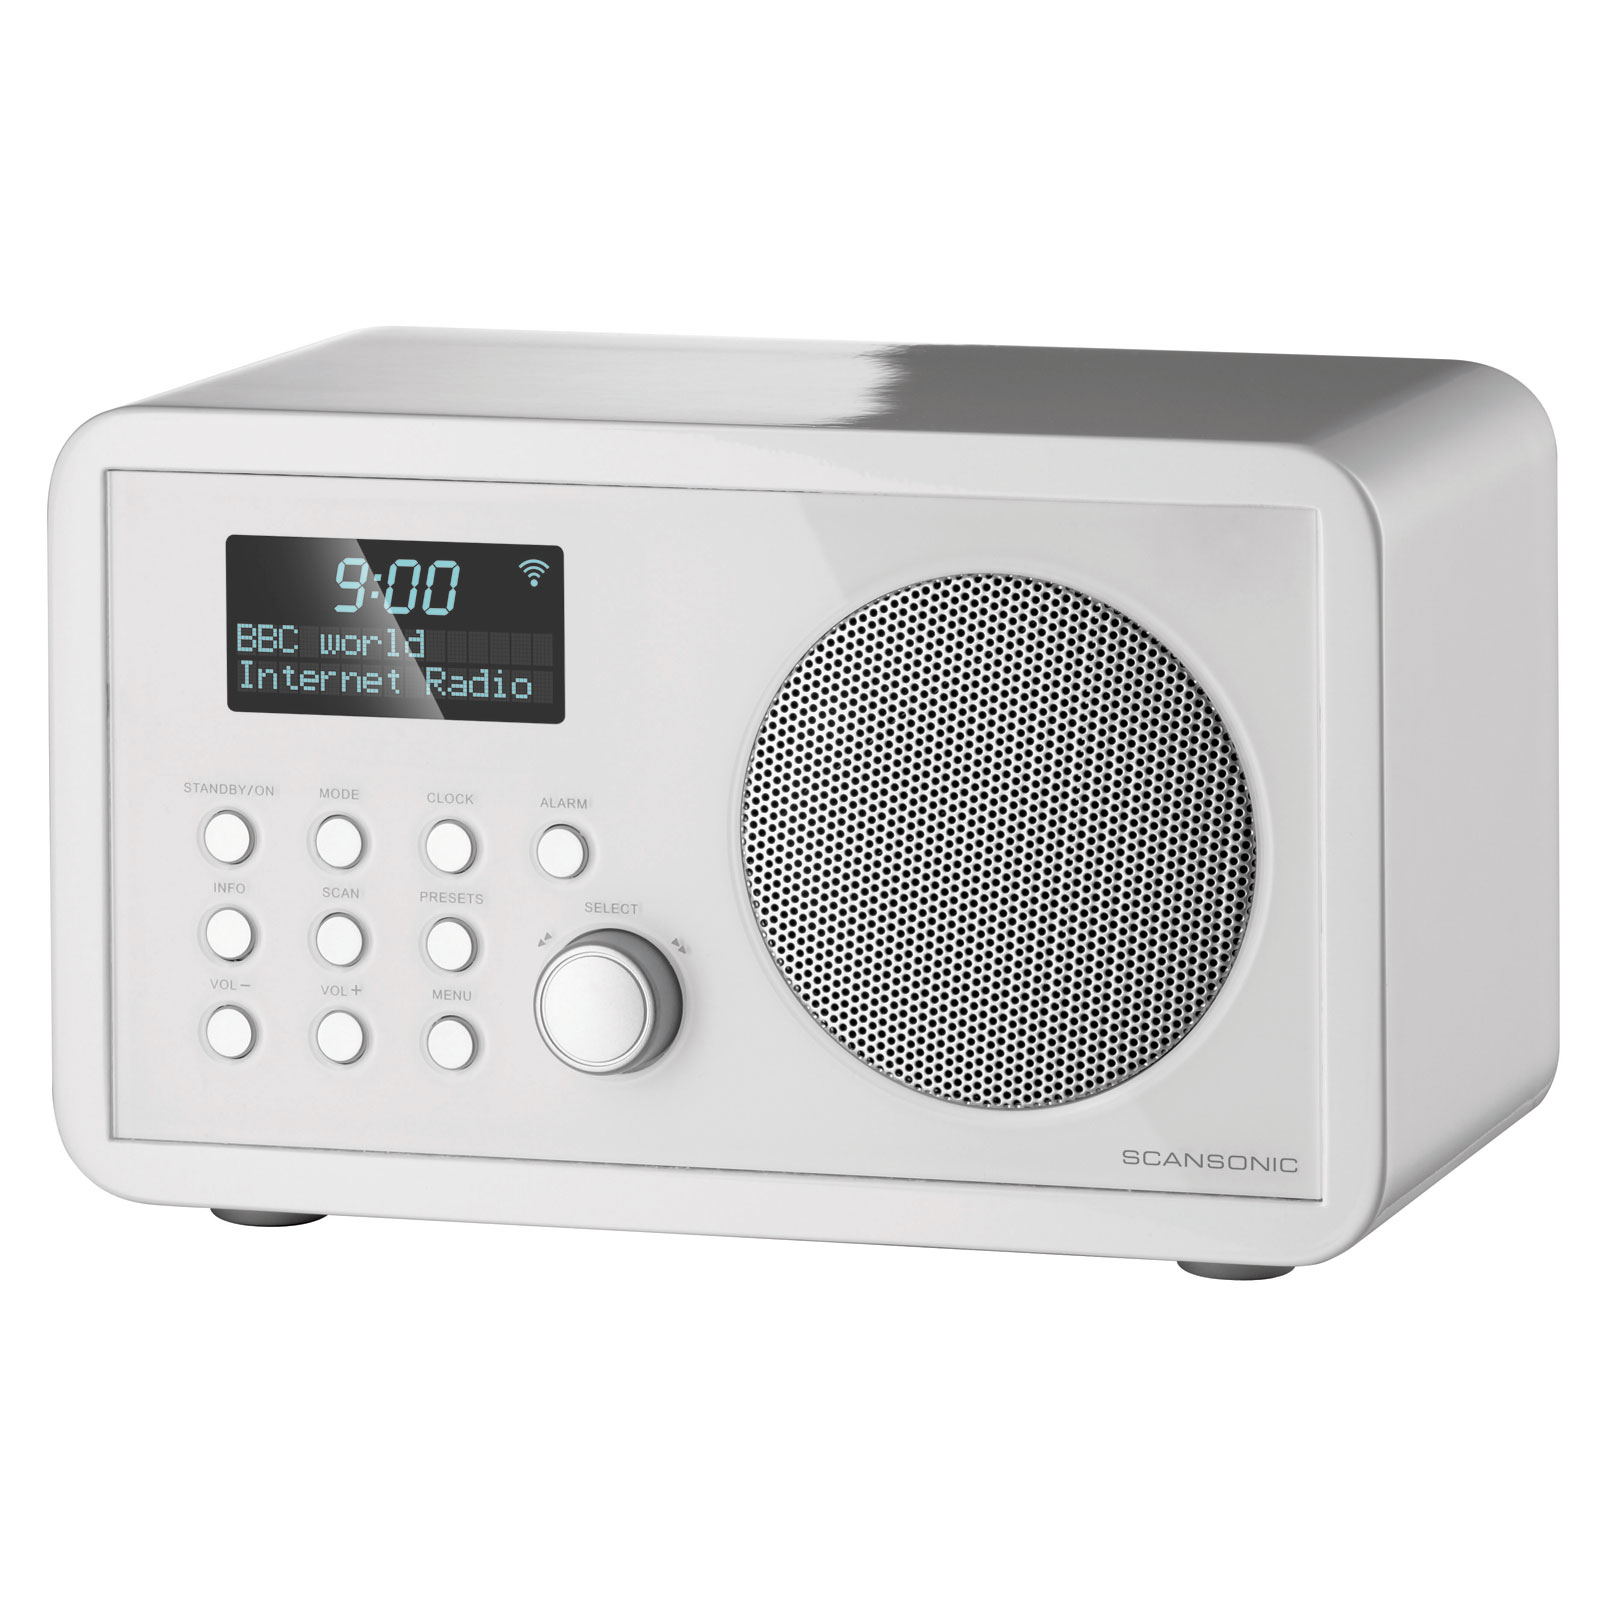 scansonic in210 blanc radio radio r veil scansonic sur. Black Bedroom Furniture Sets. Home Design Ideas